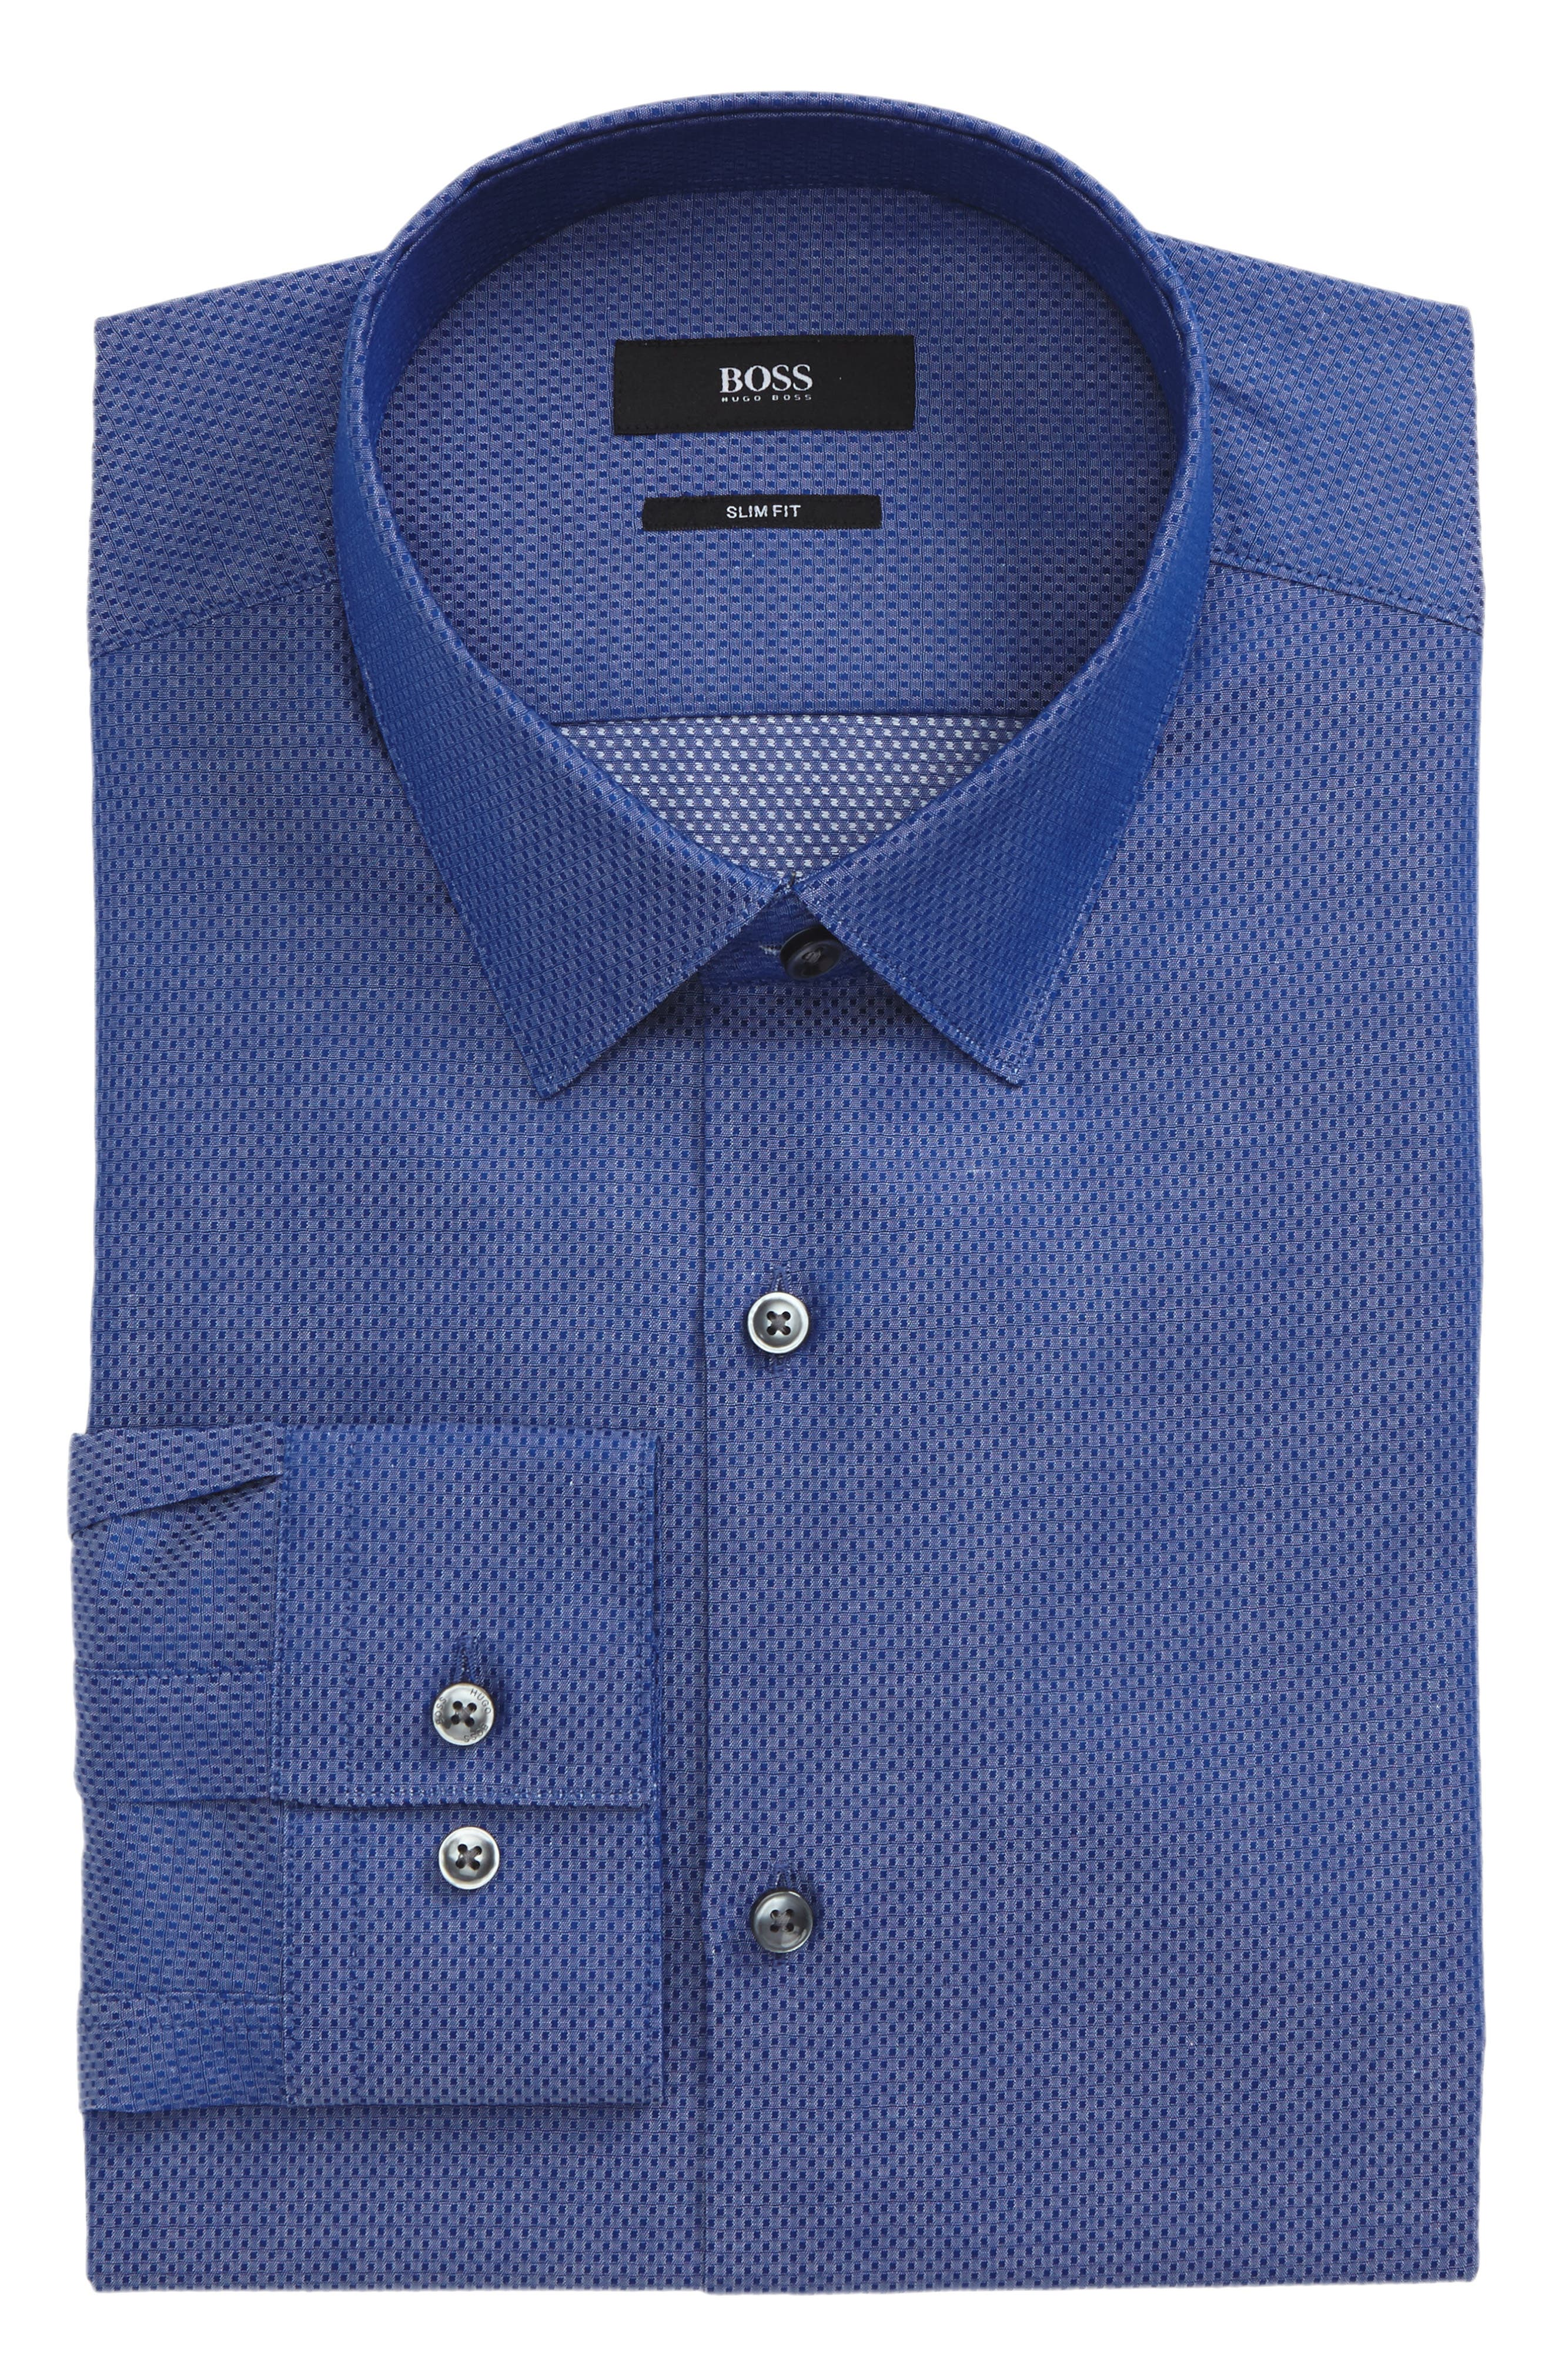 Alternate Image 1 Selected - BOSS Isko Slim Fit Textured Dress Shirt